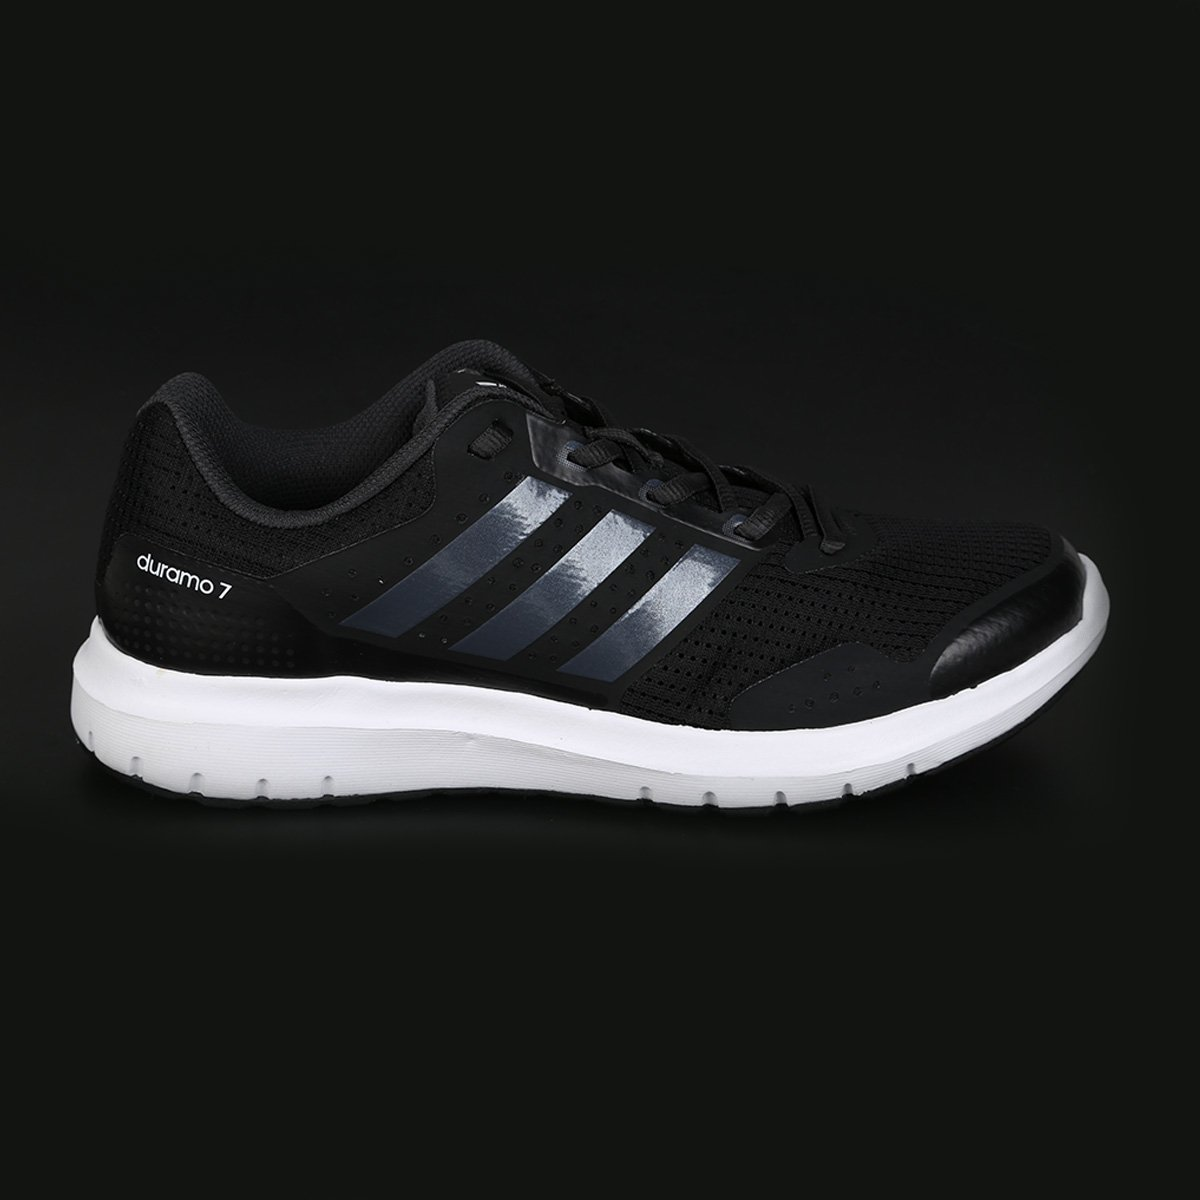 6d18a545821 Tênis Adidas Duramo 7 Masculino - Compre Agora